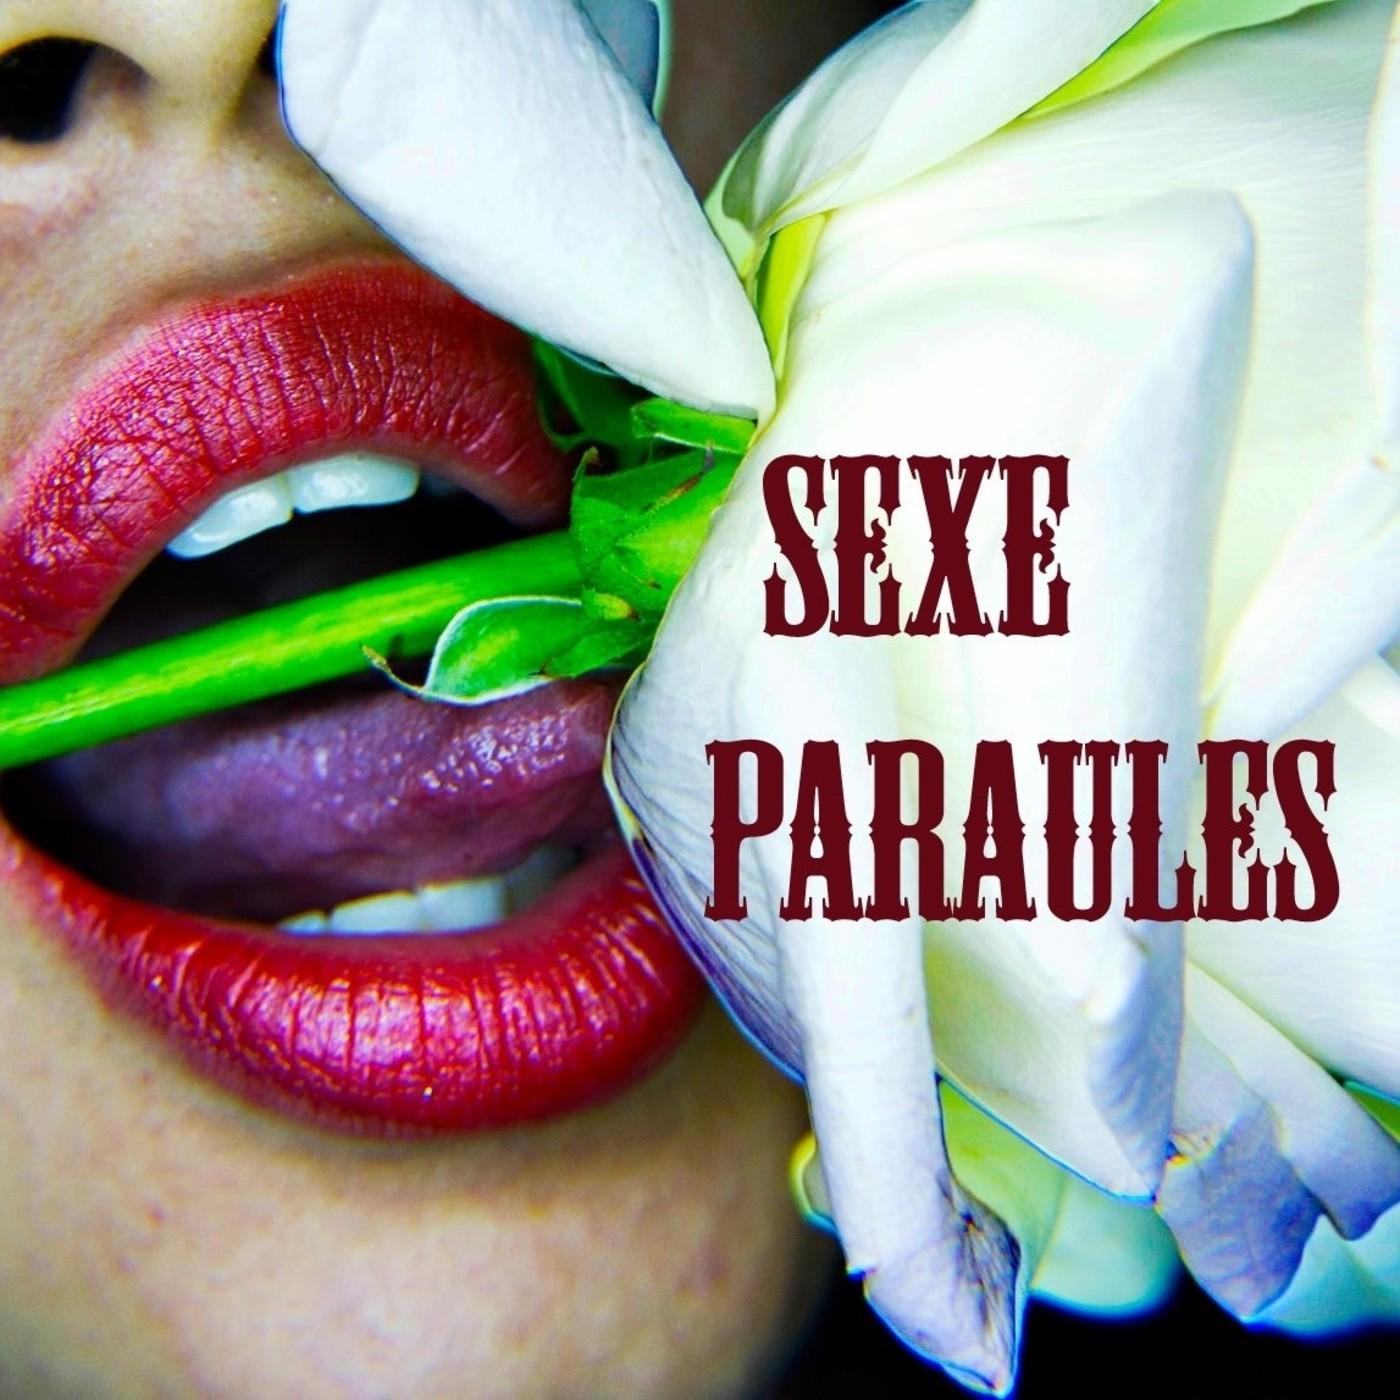 Sexe Paraules (ed. 16): Historia del porno: de ilegal a su época dorada